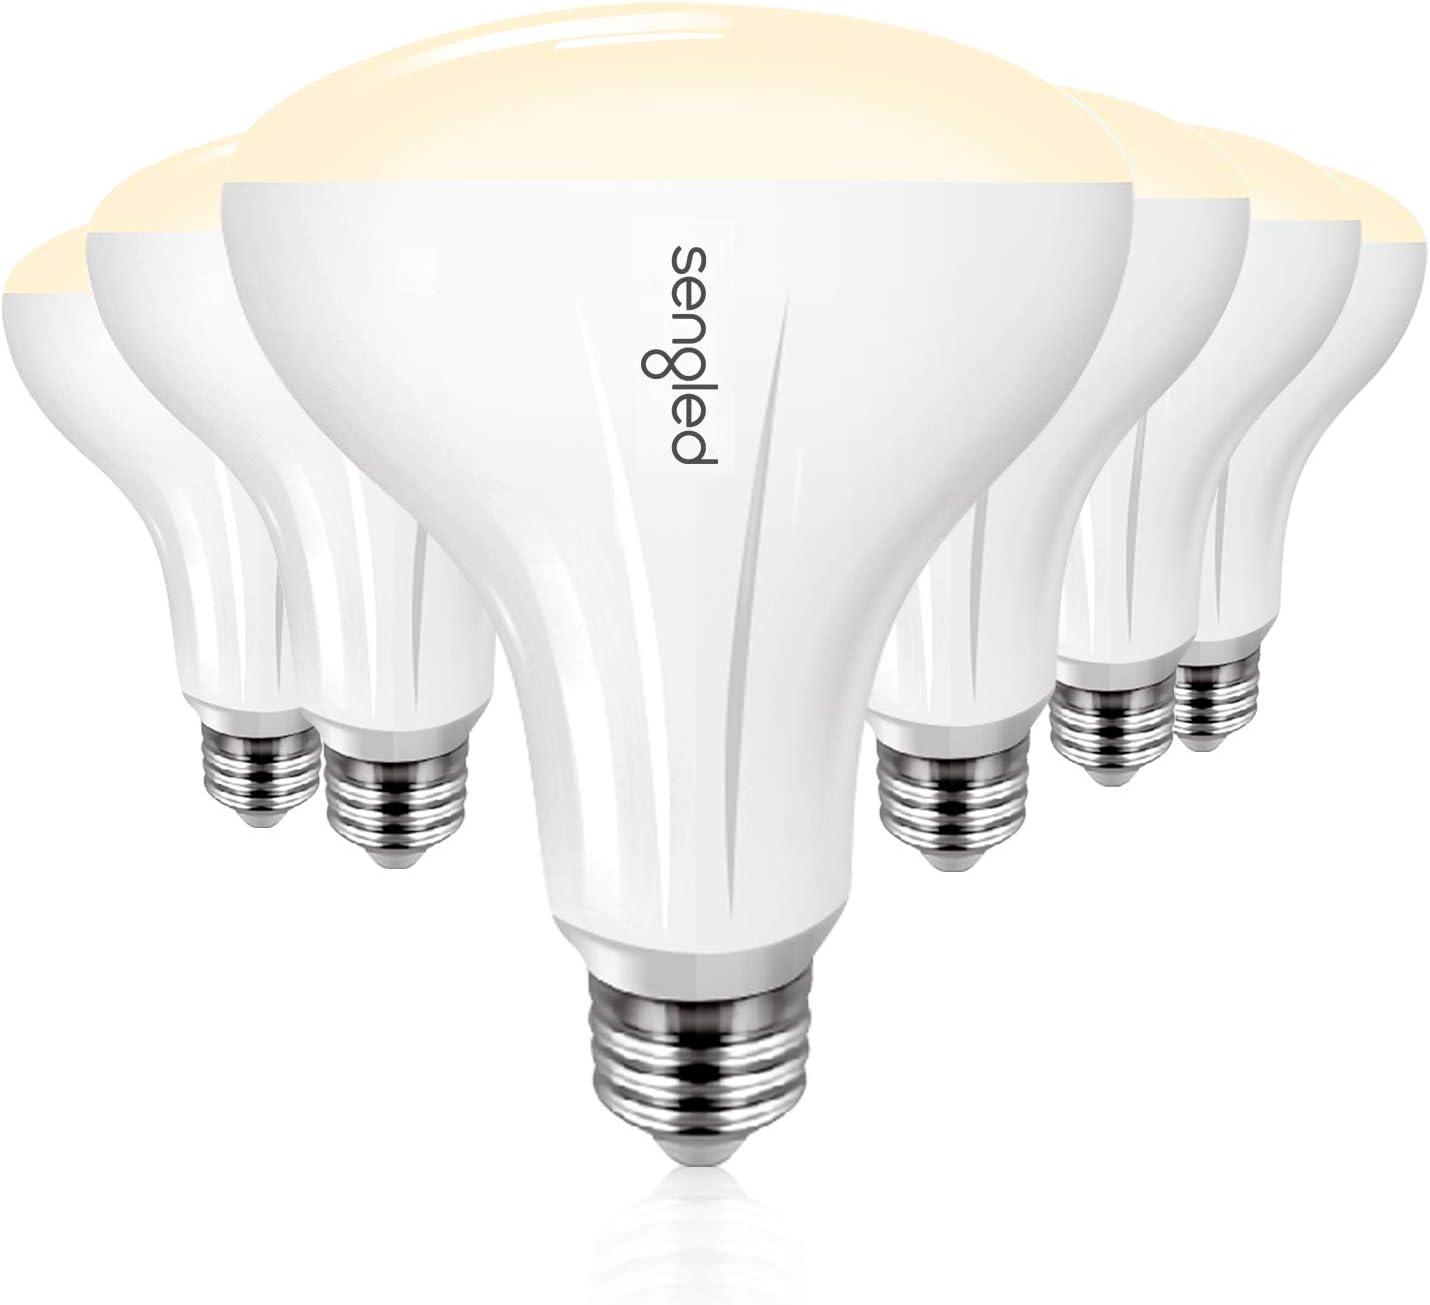 Sengled Smart Light Bulb 6 Pack, Smart Bulbs That Work with Alexa, Google Home & IFTTT (Smart Hub Required), Smart LED Light Bulb BR30 Soft White Dimmable Light, 65W Equivalent